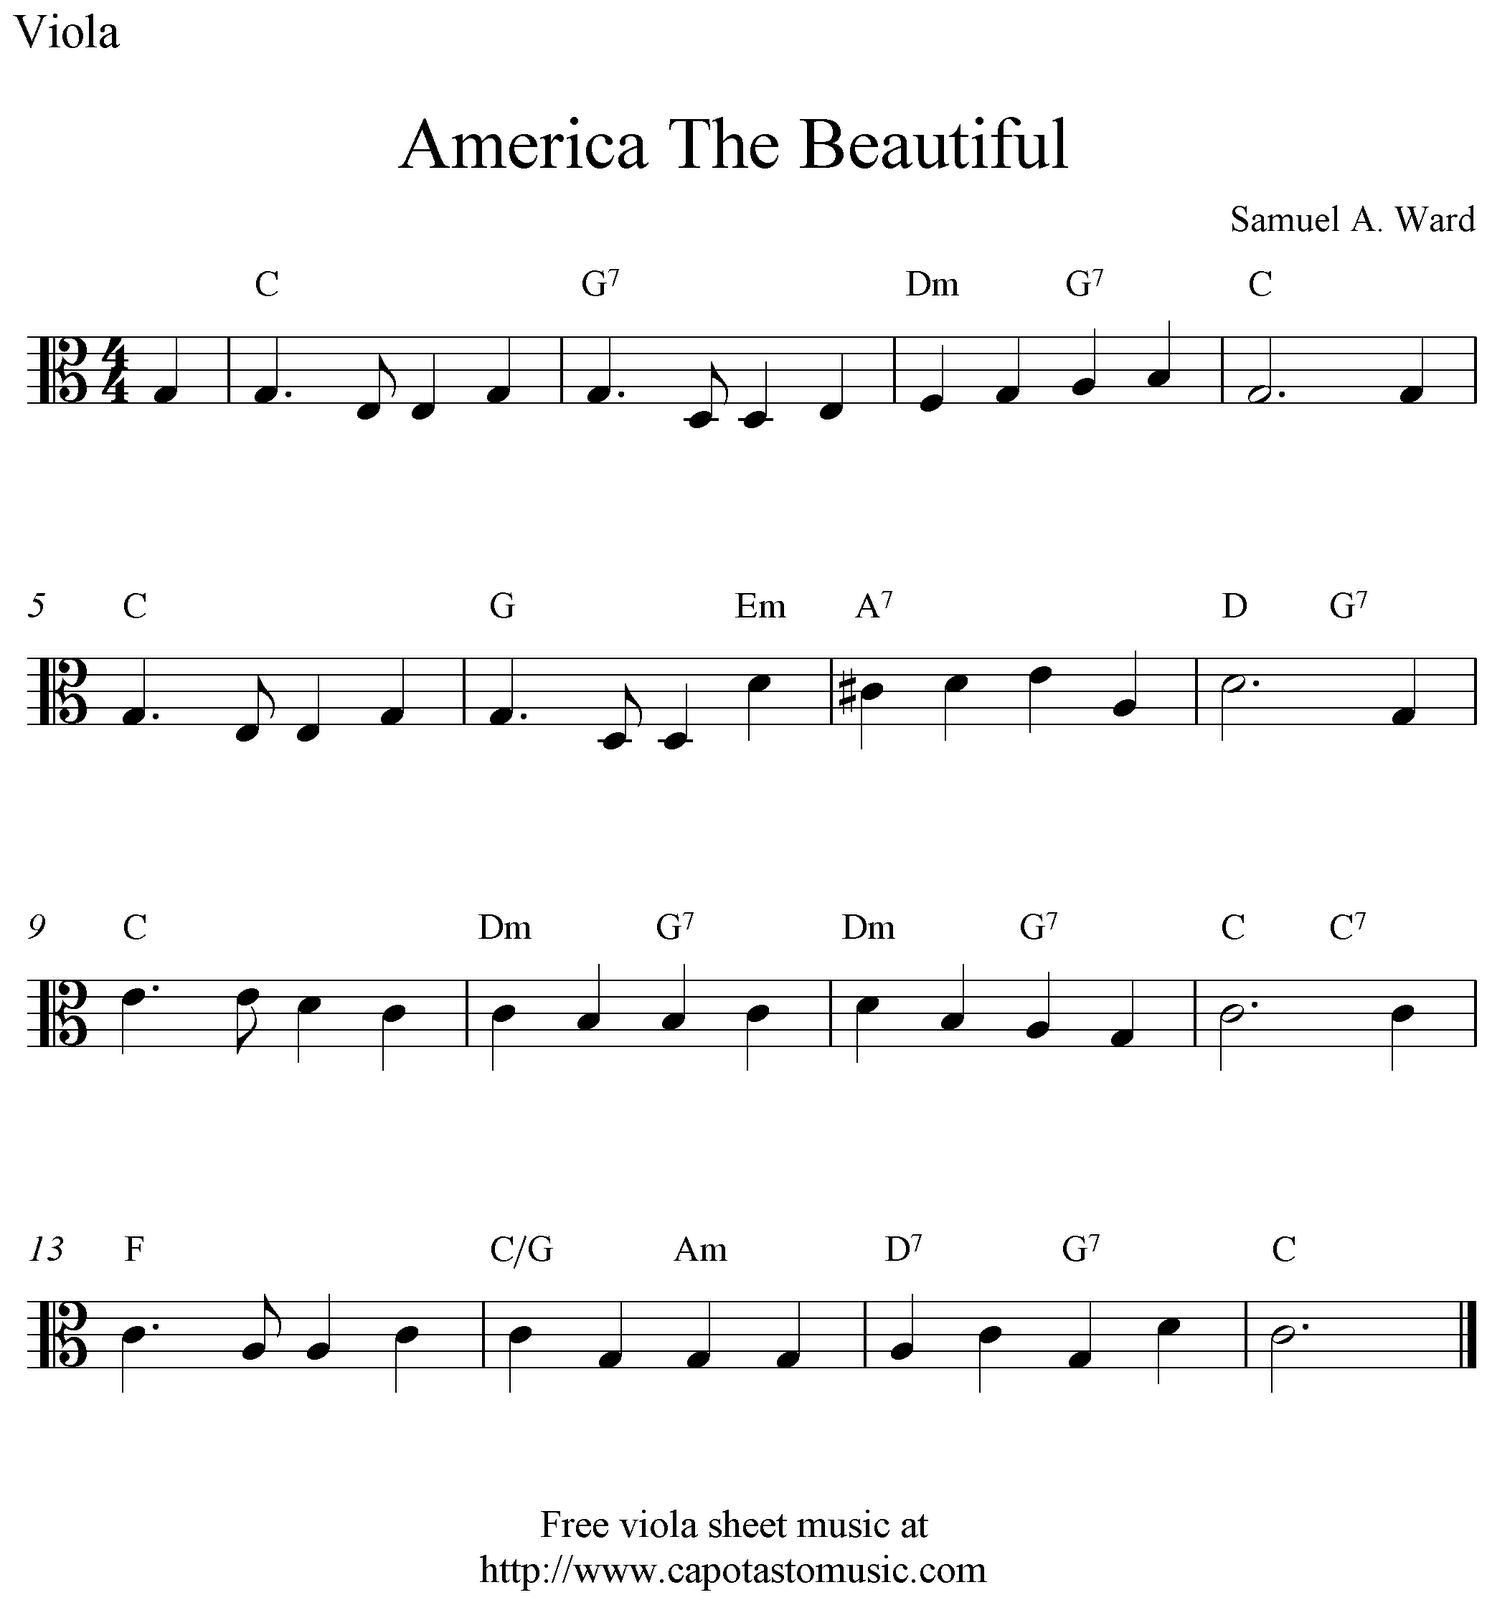 Free viola sheet music, America The Beautiful